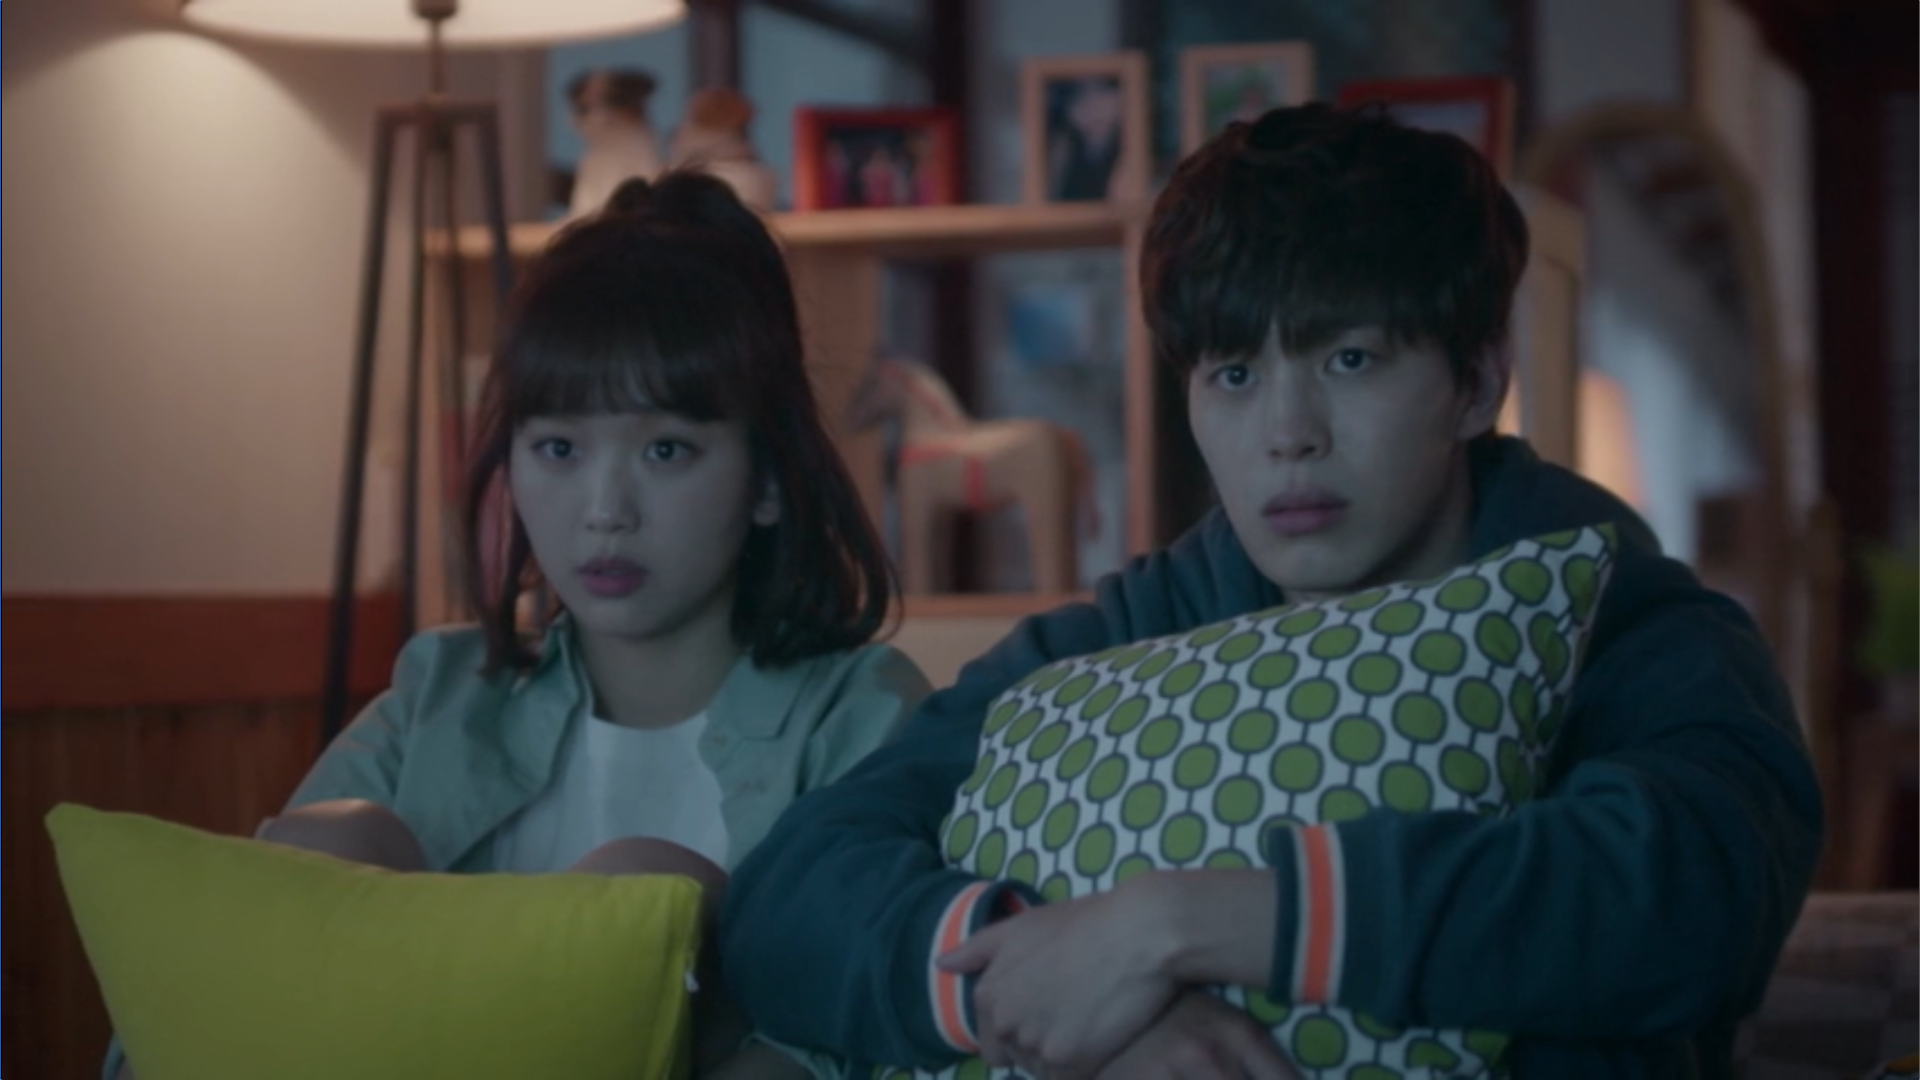 Wednesday 3:30 PM Seon Eun-woo and Yoon Jae-won watching R movie